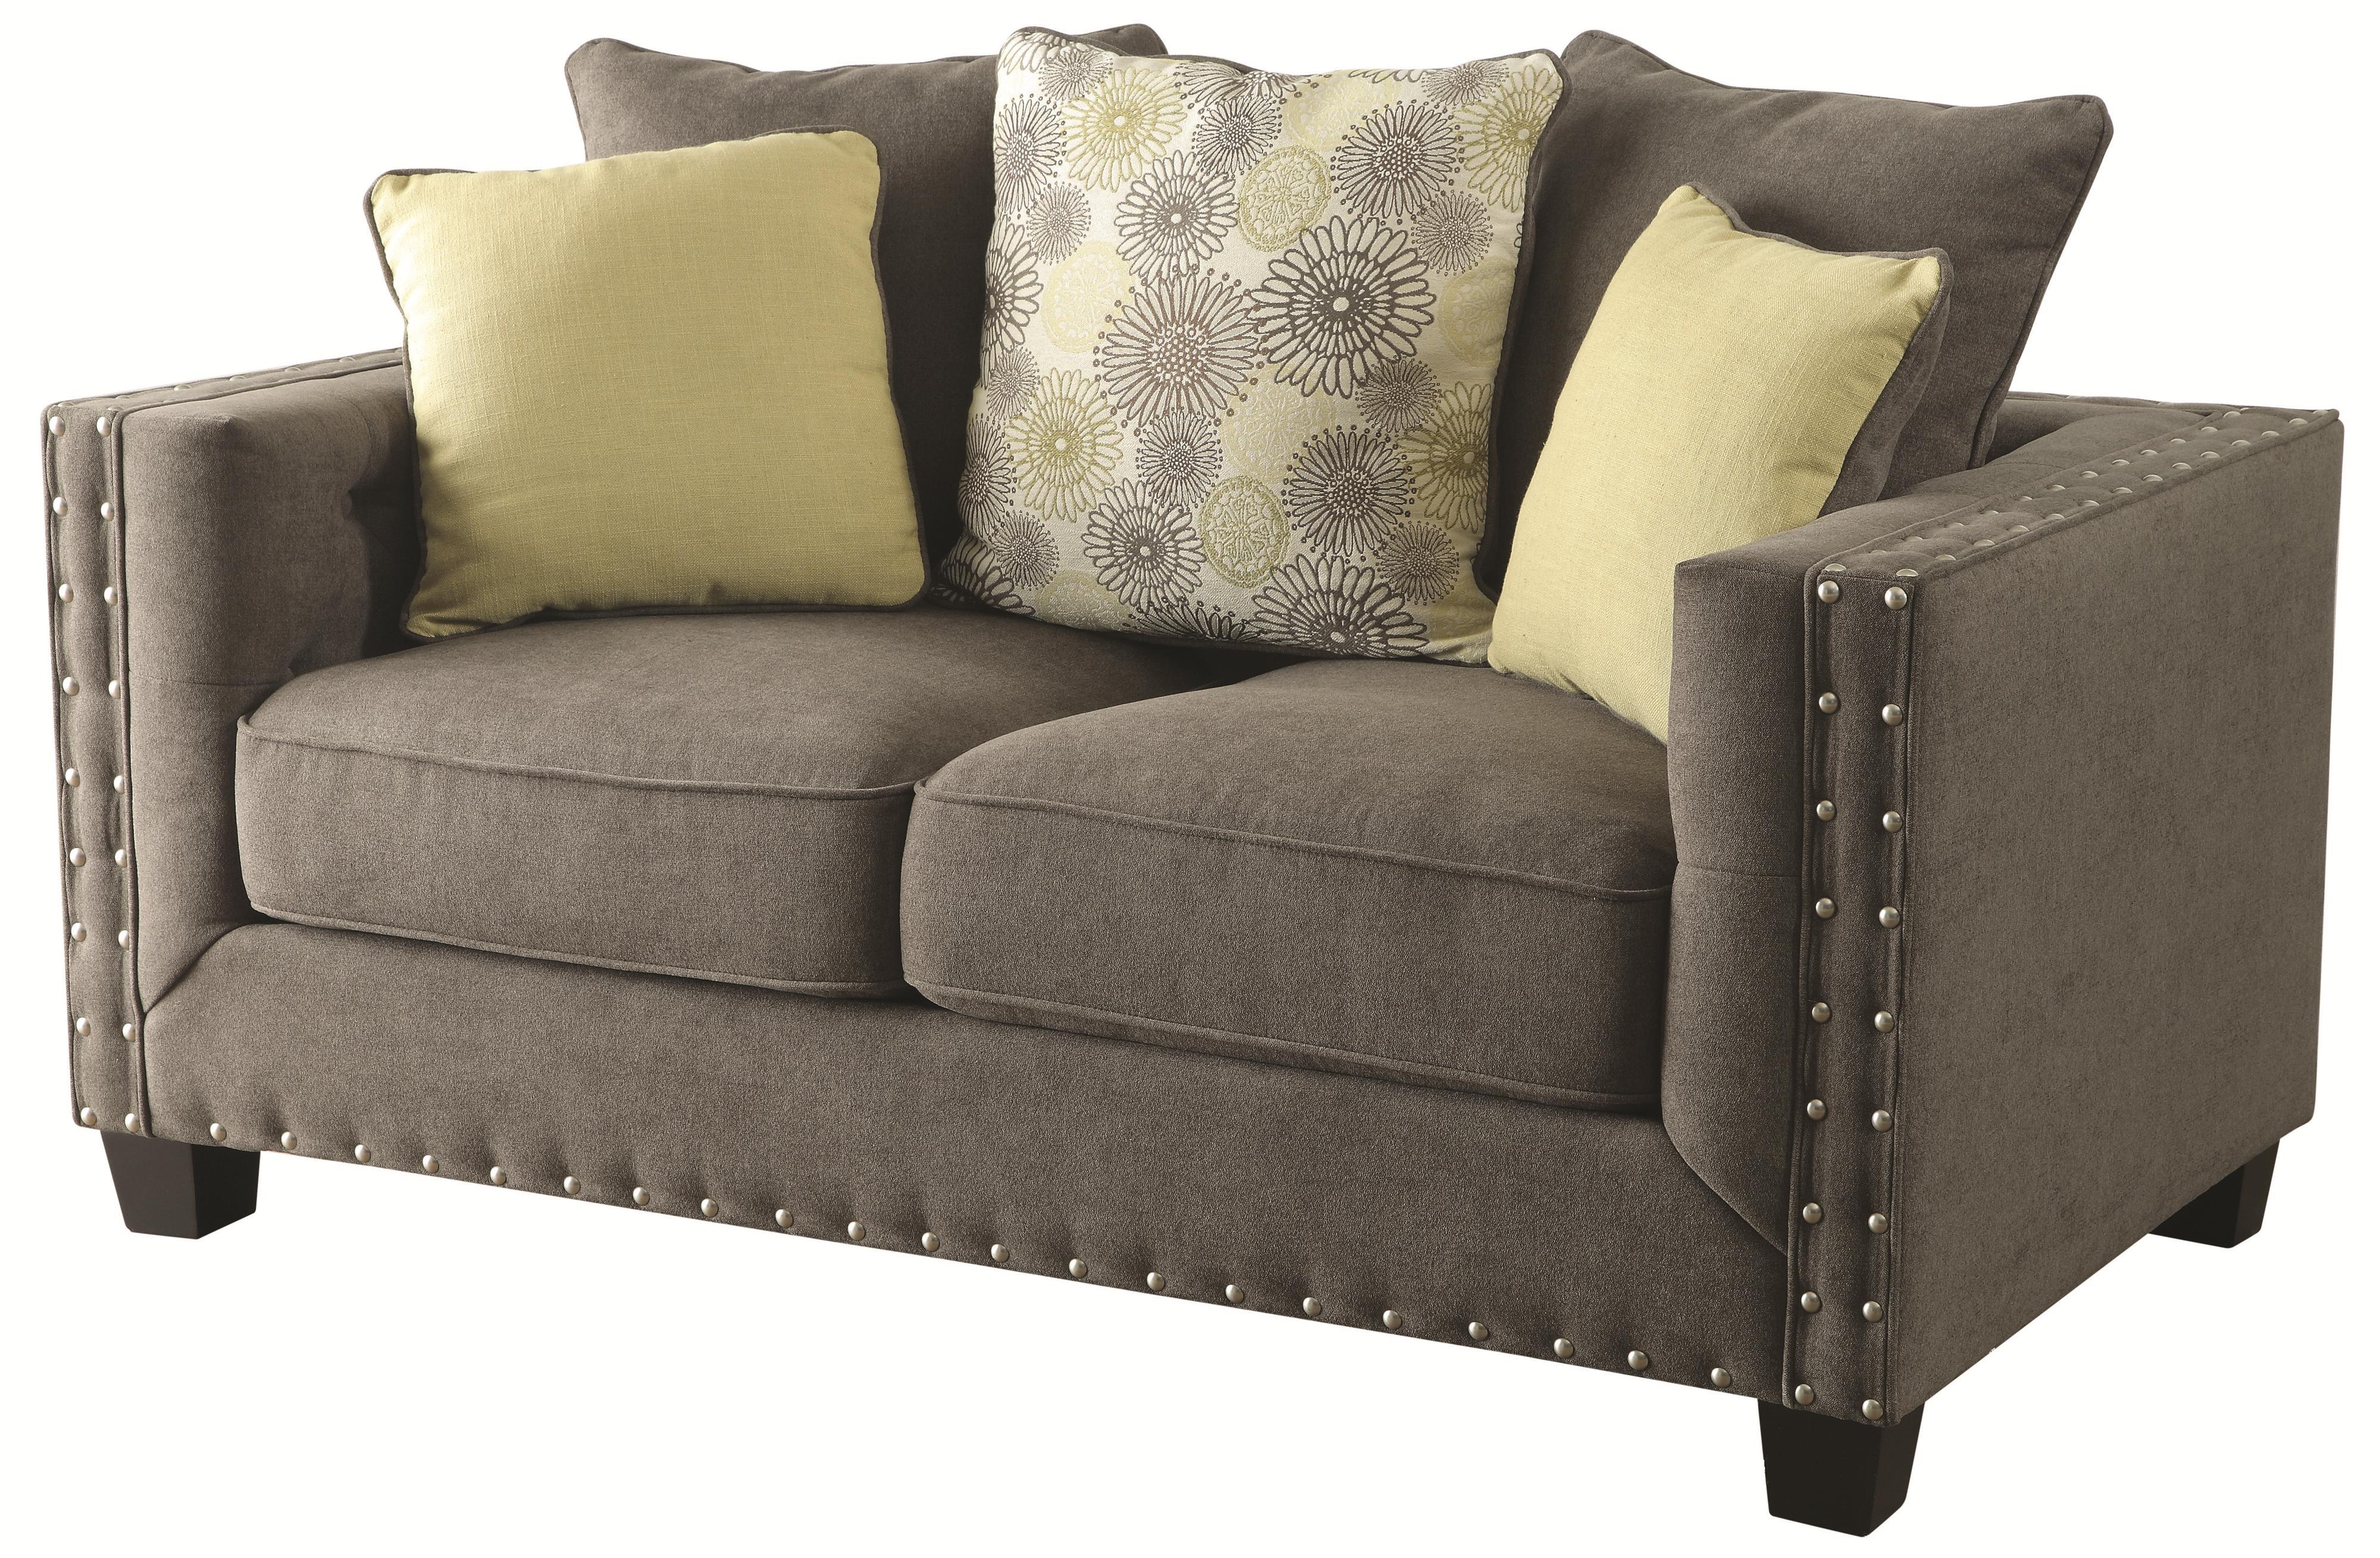 Coaster Kelvington Love Seat - Item Number: 501422-Kelvington Charcoal